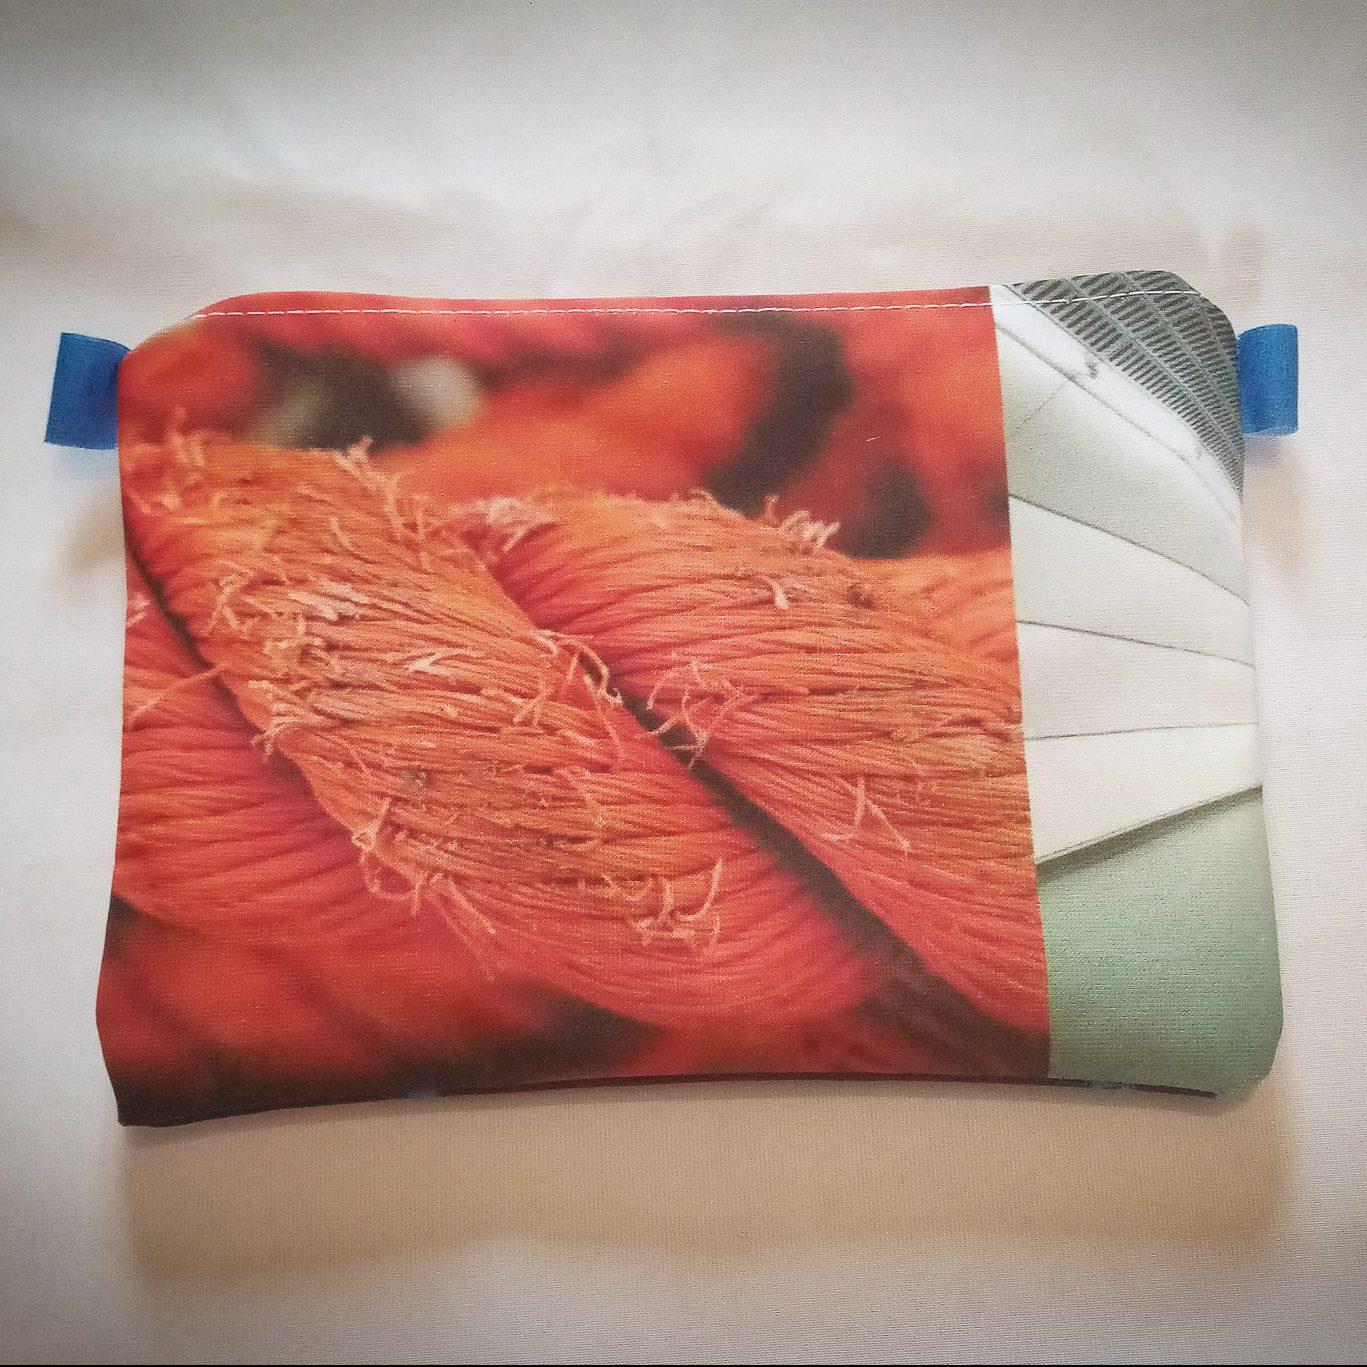 Handmade Fabric Lined Pencil Case/Makeup Bag, Rope/Blue